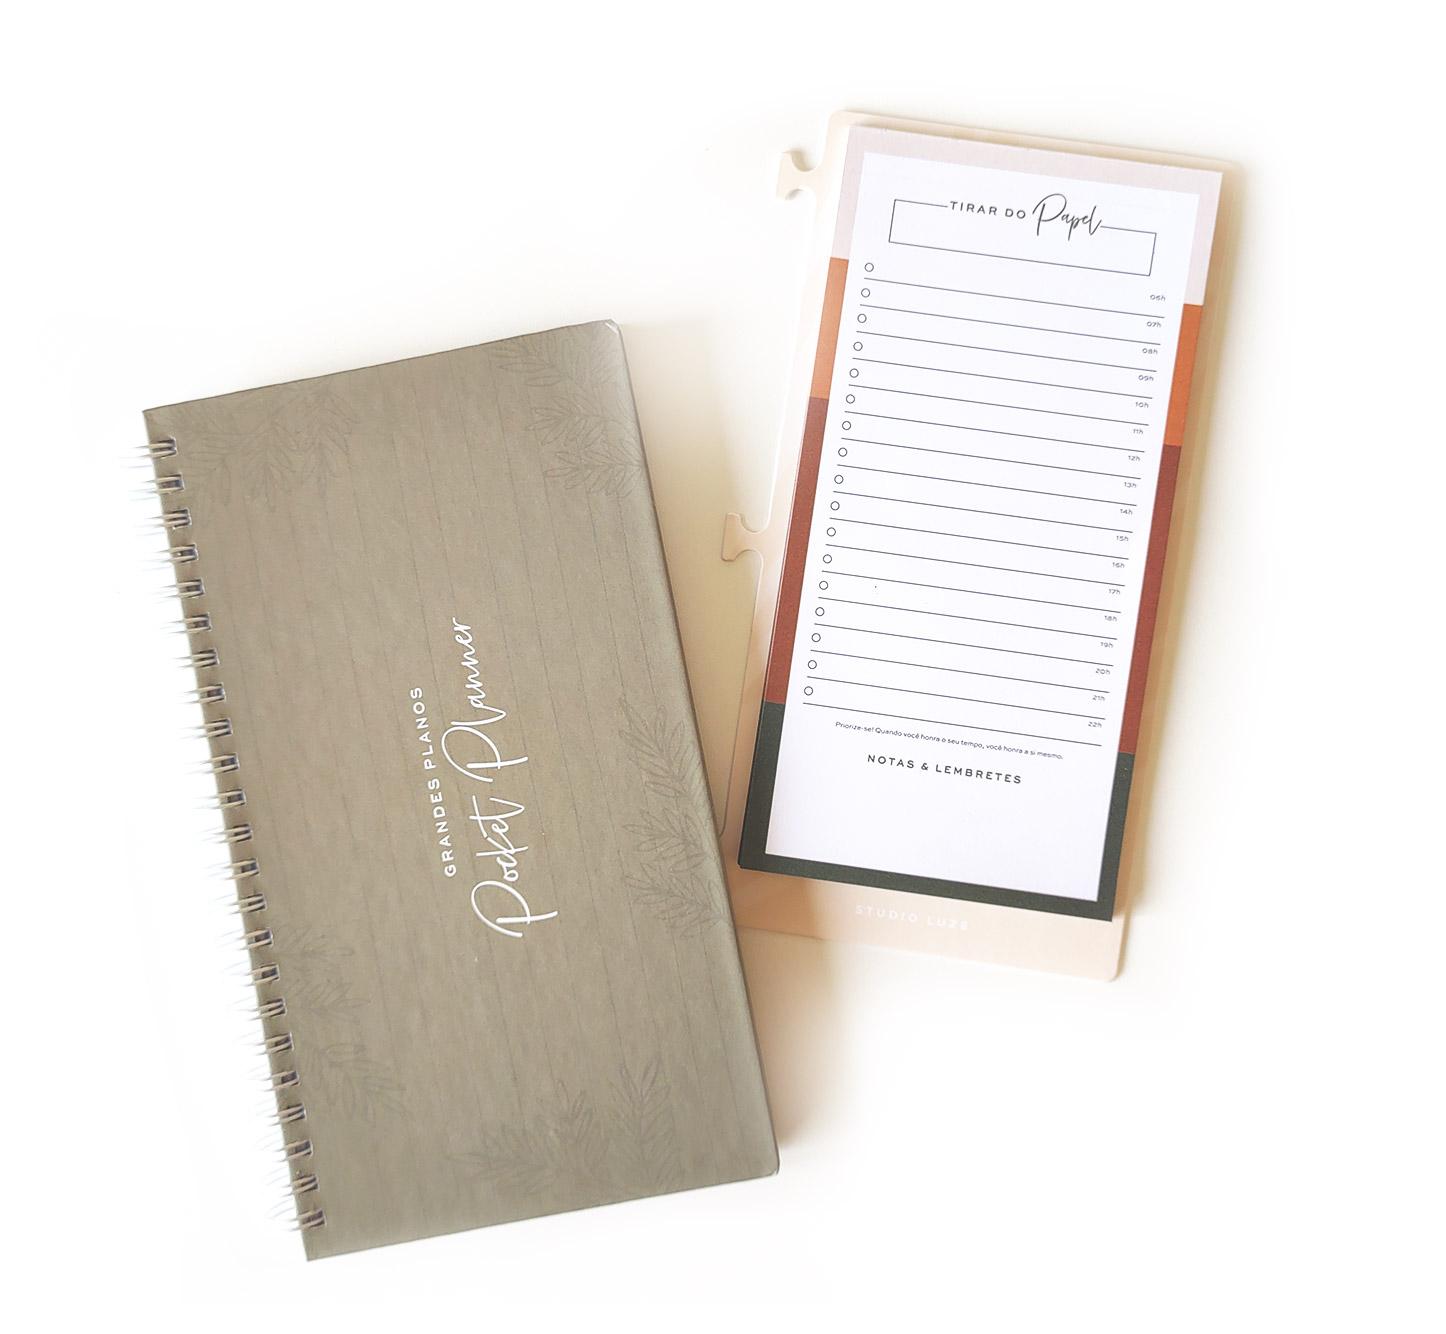 Kit Pocket Lista | Oliva | Studio Luze